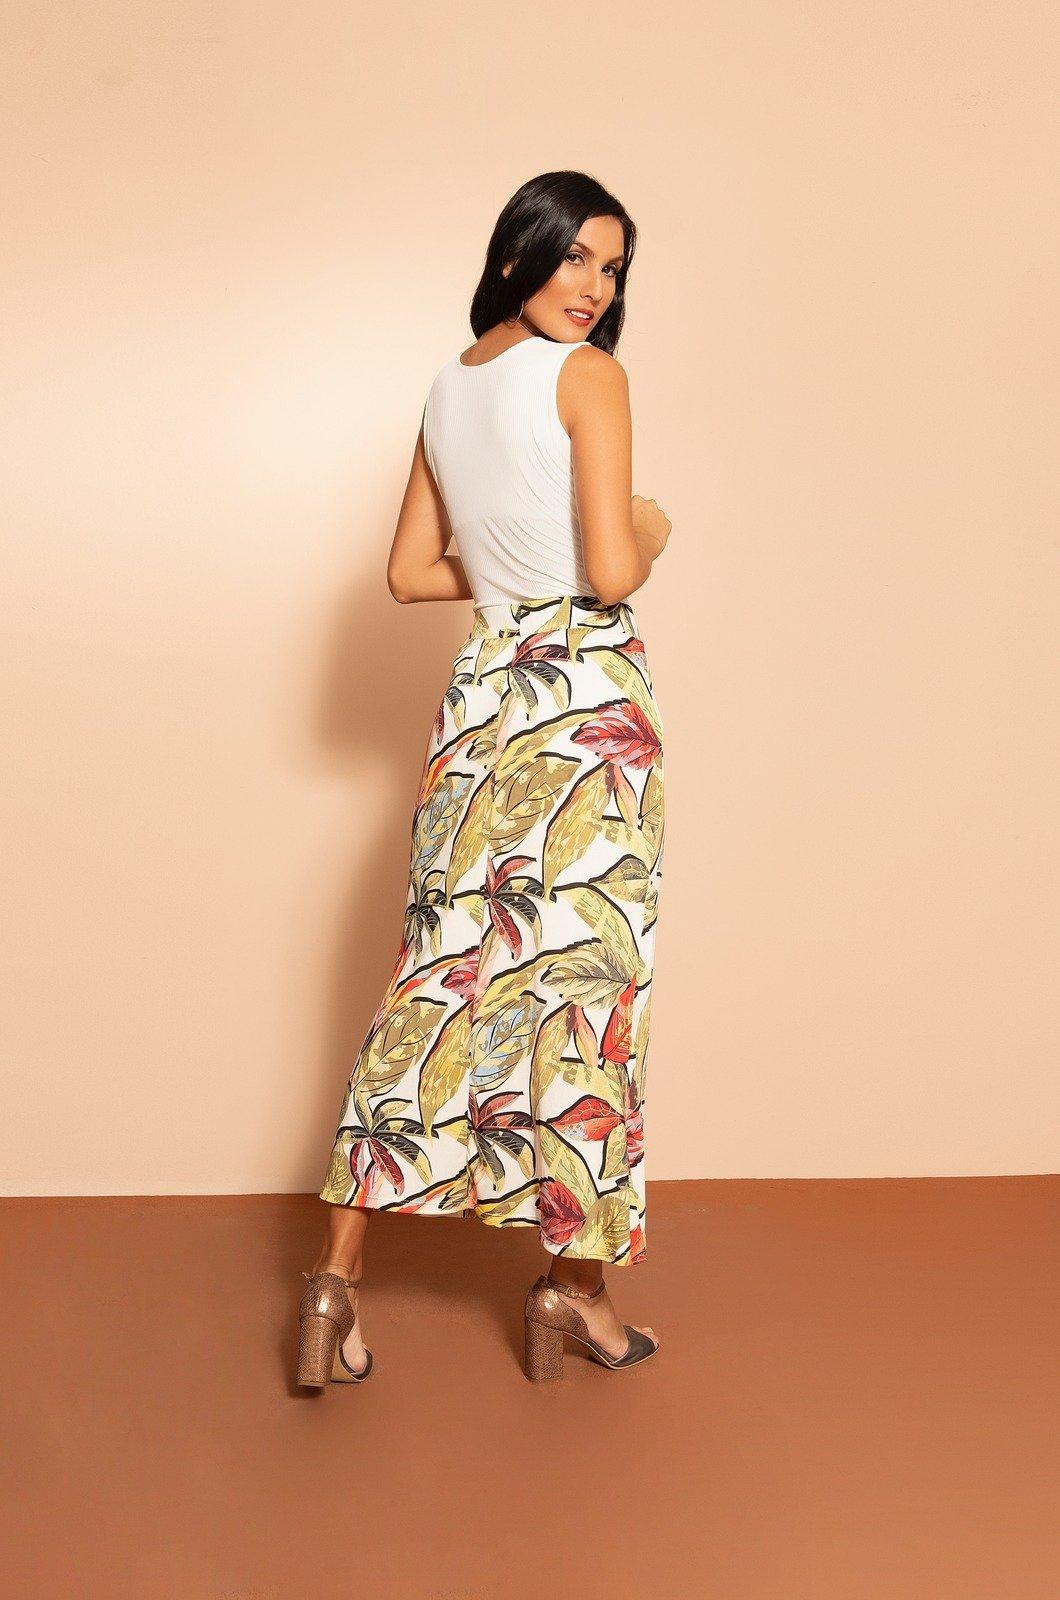 Falda larga estampada - Chazari 3315-20 III